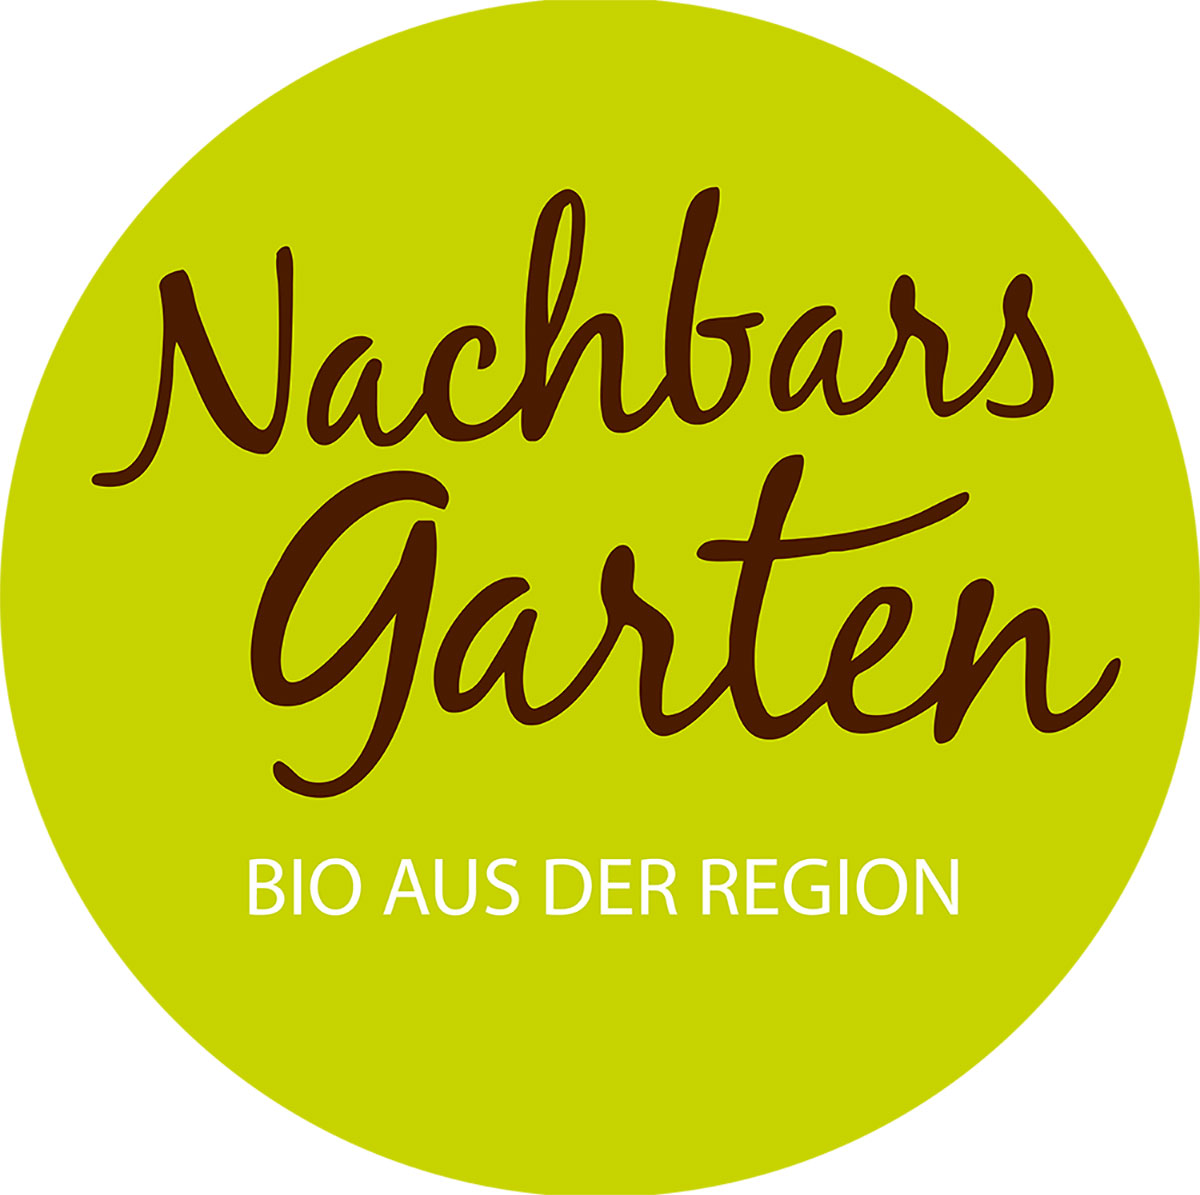 Nachbars Garten